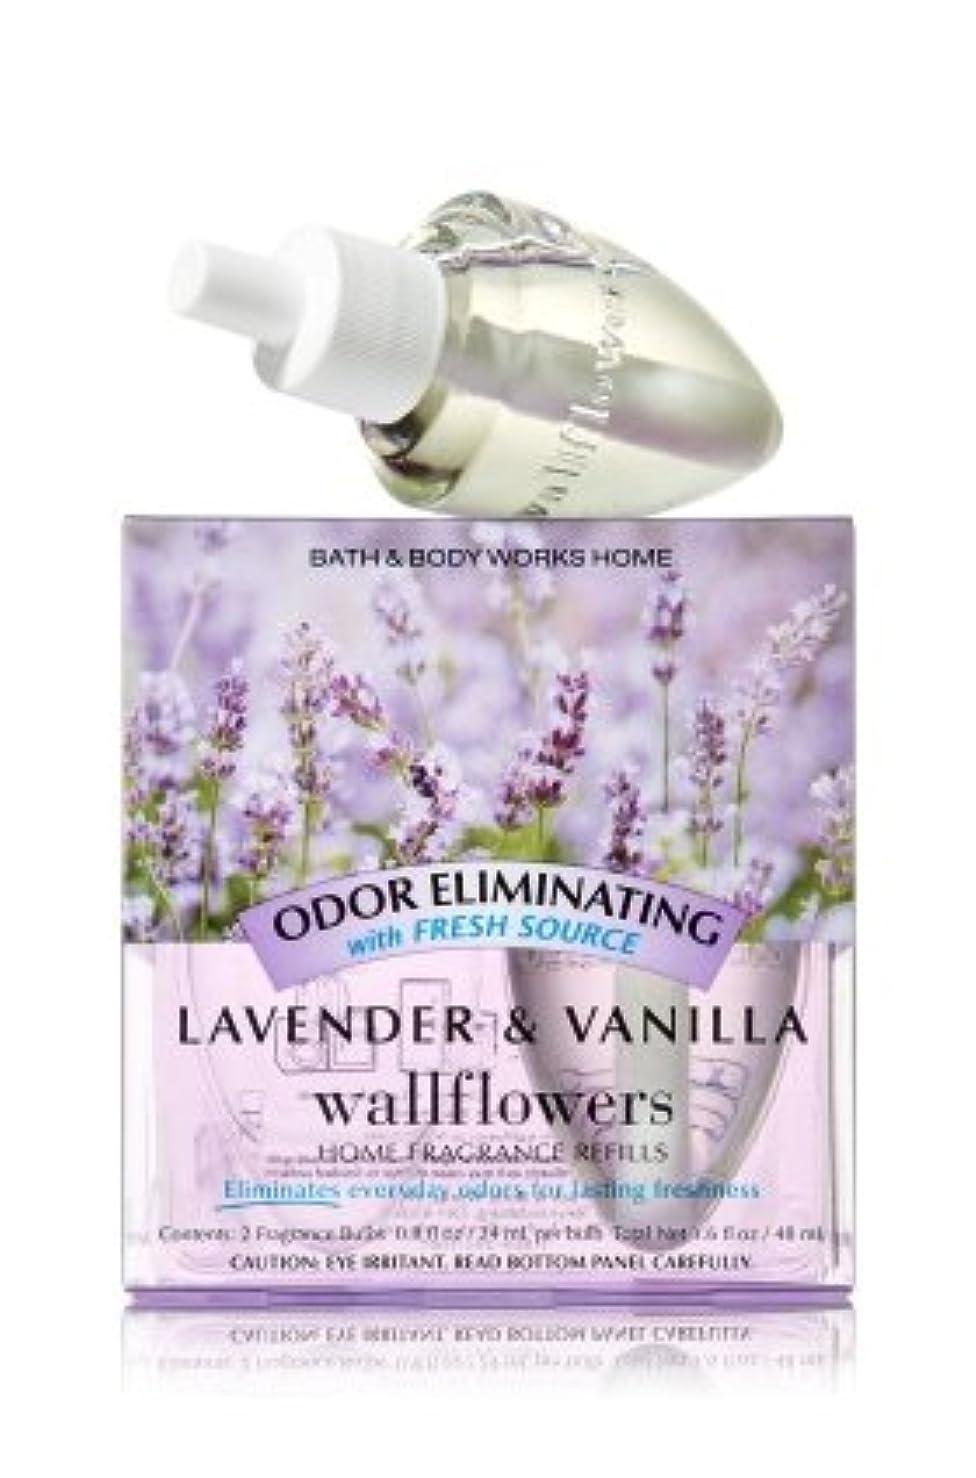 Bath & Body Works(バス&ボディワークス)ラベンダー&バニラ ホームフレグランス レフィル2本セット(本体は別売りです)Wallflowers 2 Pack Refill [並行輸入品]